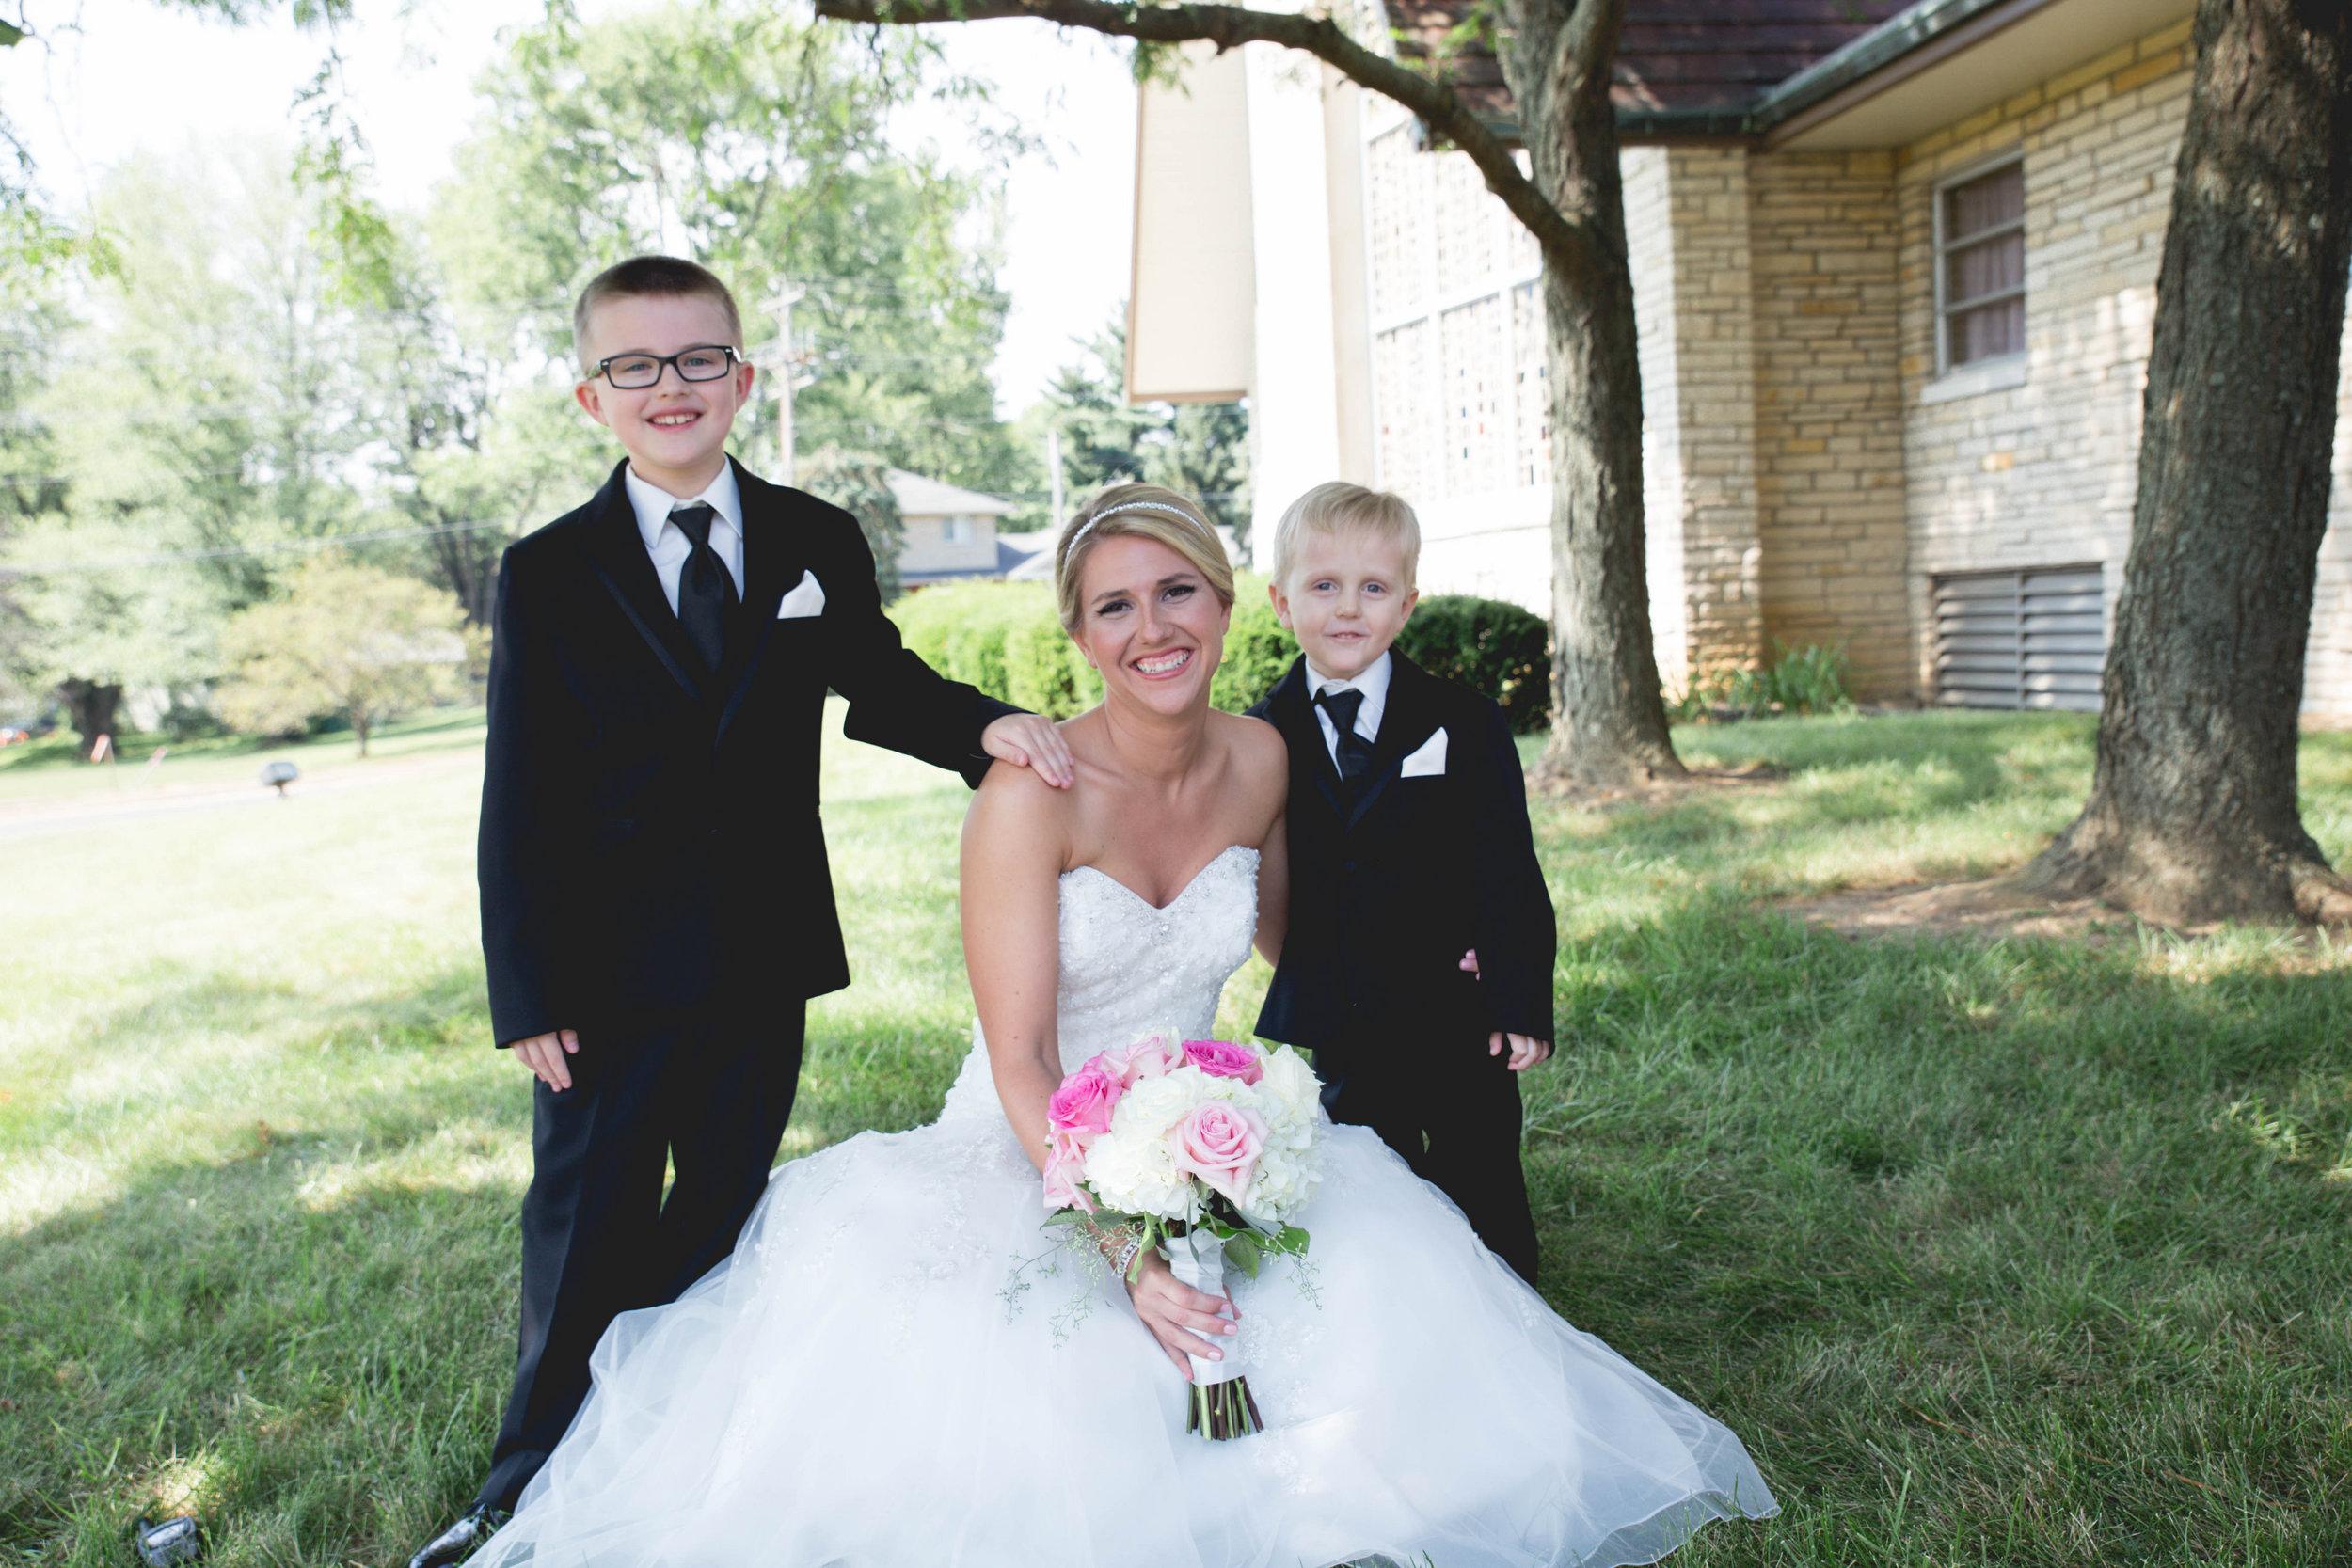 Donelson Wedding-Donelson-0140.jpg